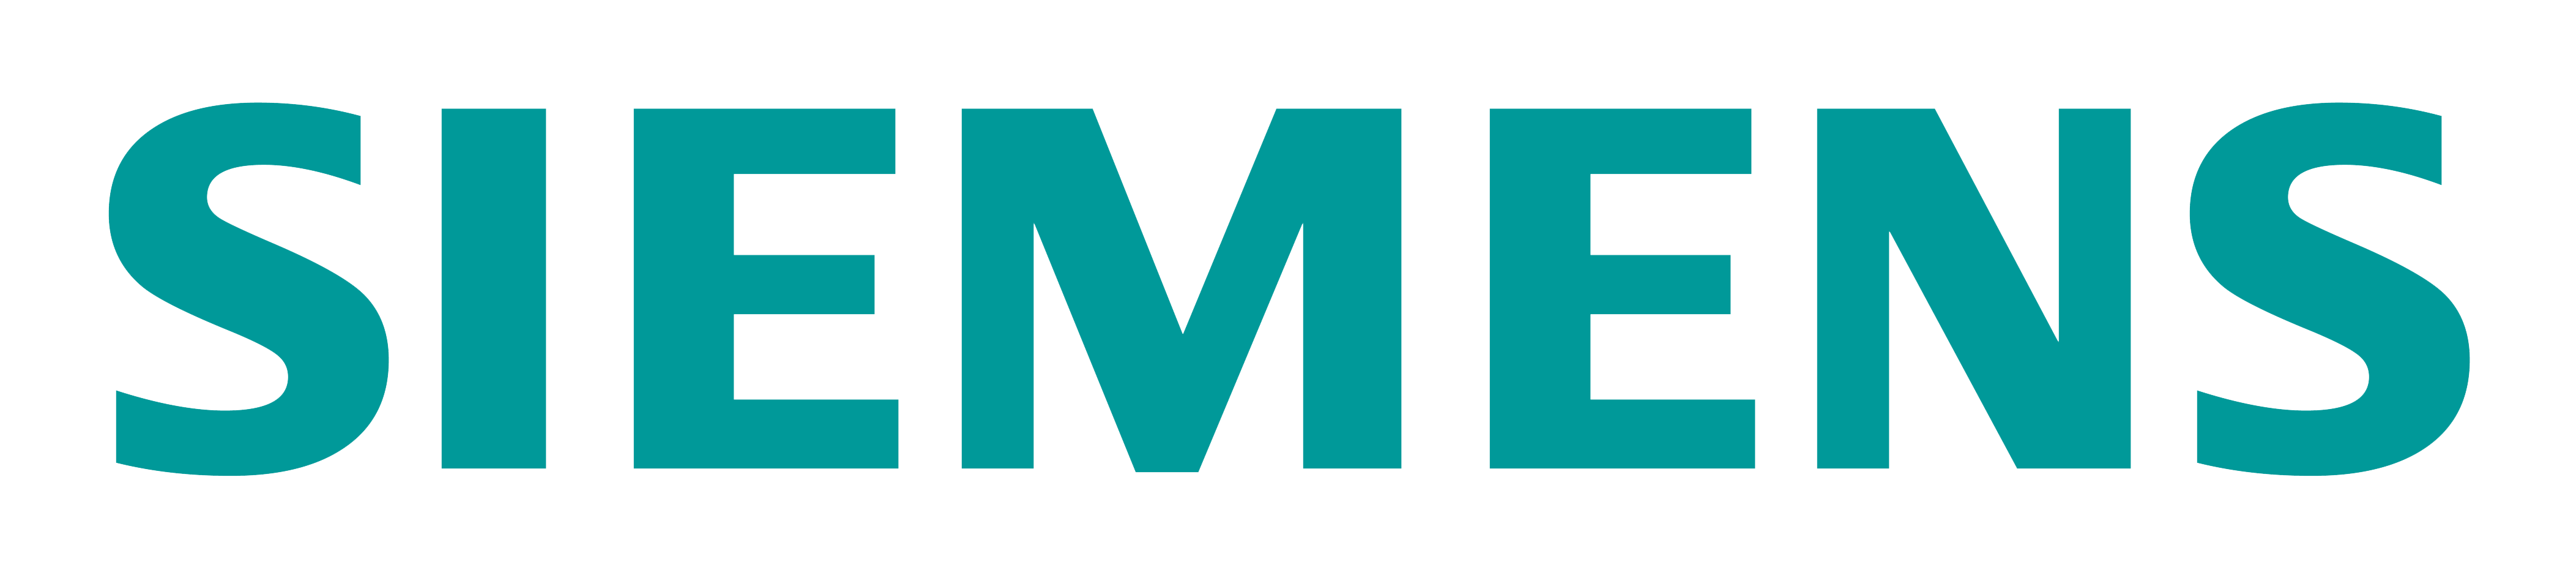 https://afbshop.de/media/image/3f/ec/bc/Siemens_freigestellt.png